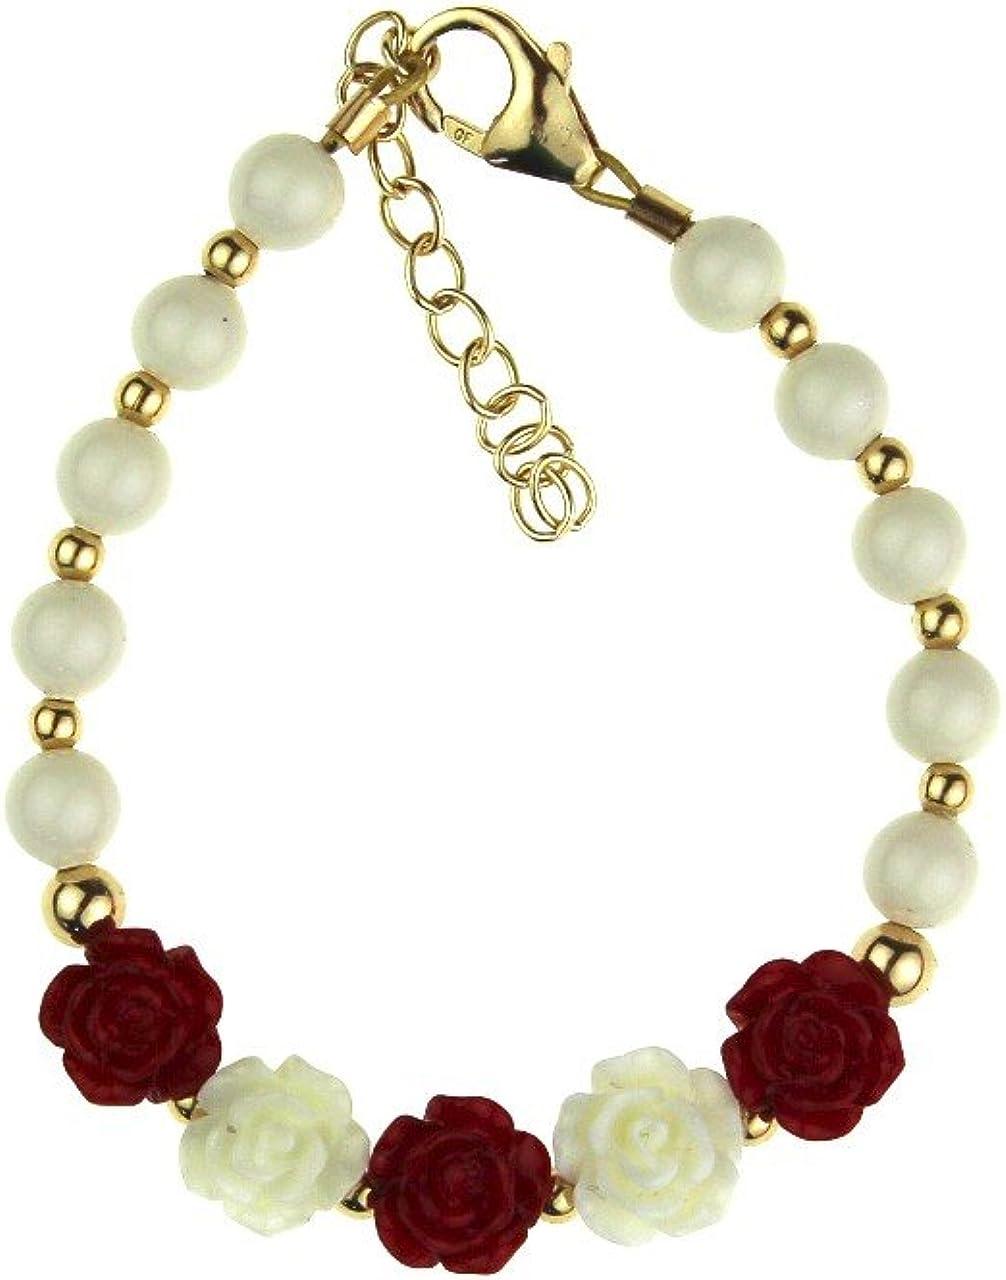 Selling Crystal Dream Elegant 14KT Luxury Gold-Filled Br Girl Baby Beads